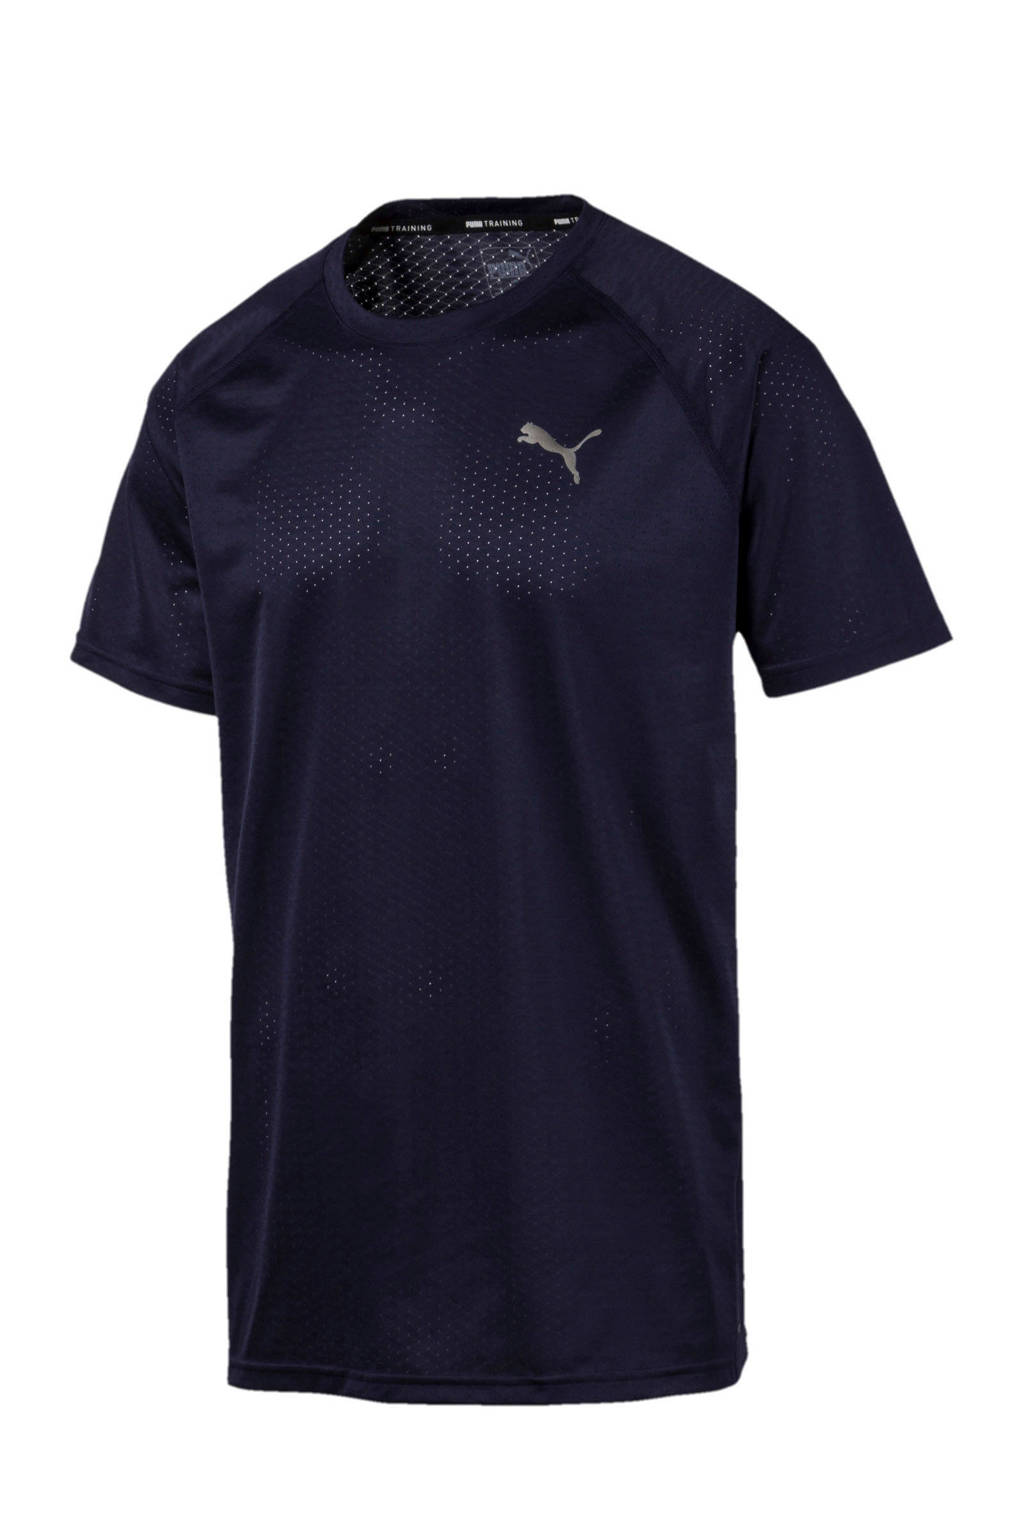 Puma   sport T-shirt donkerblauw, Donkerblauw